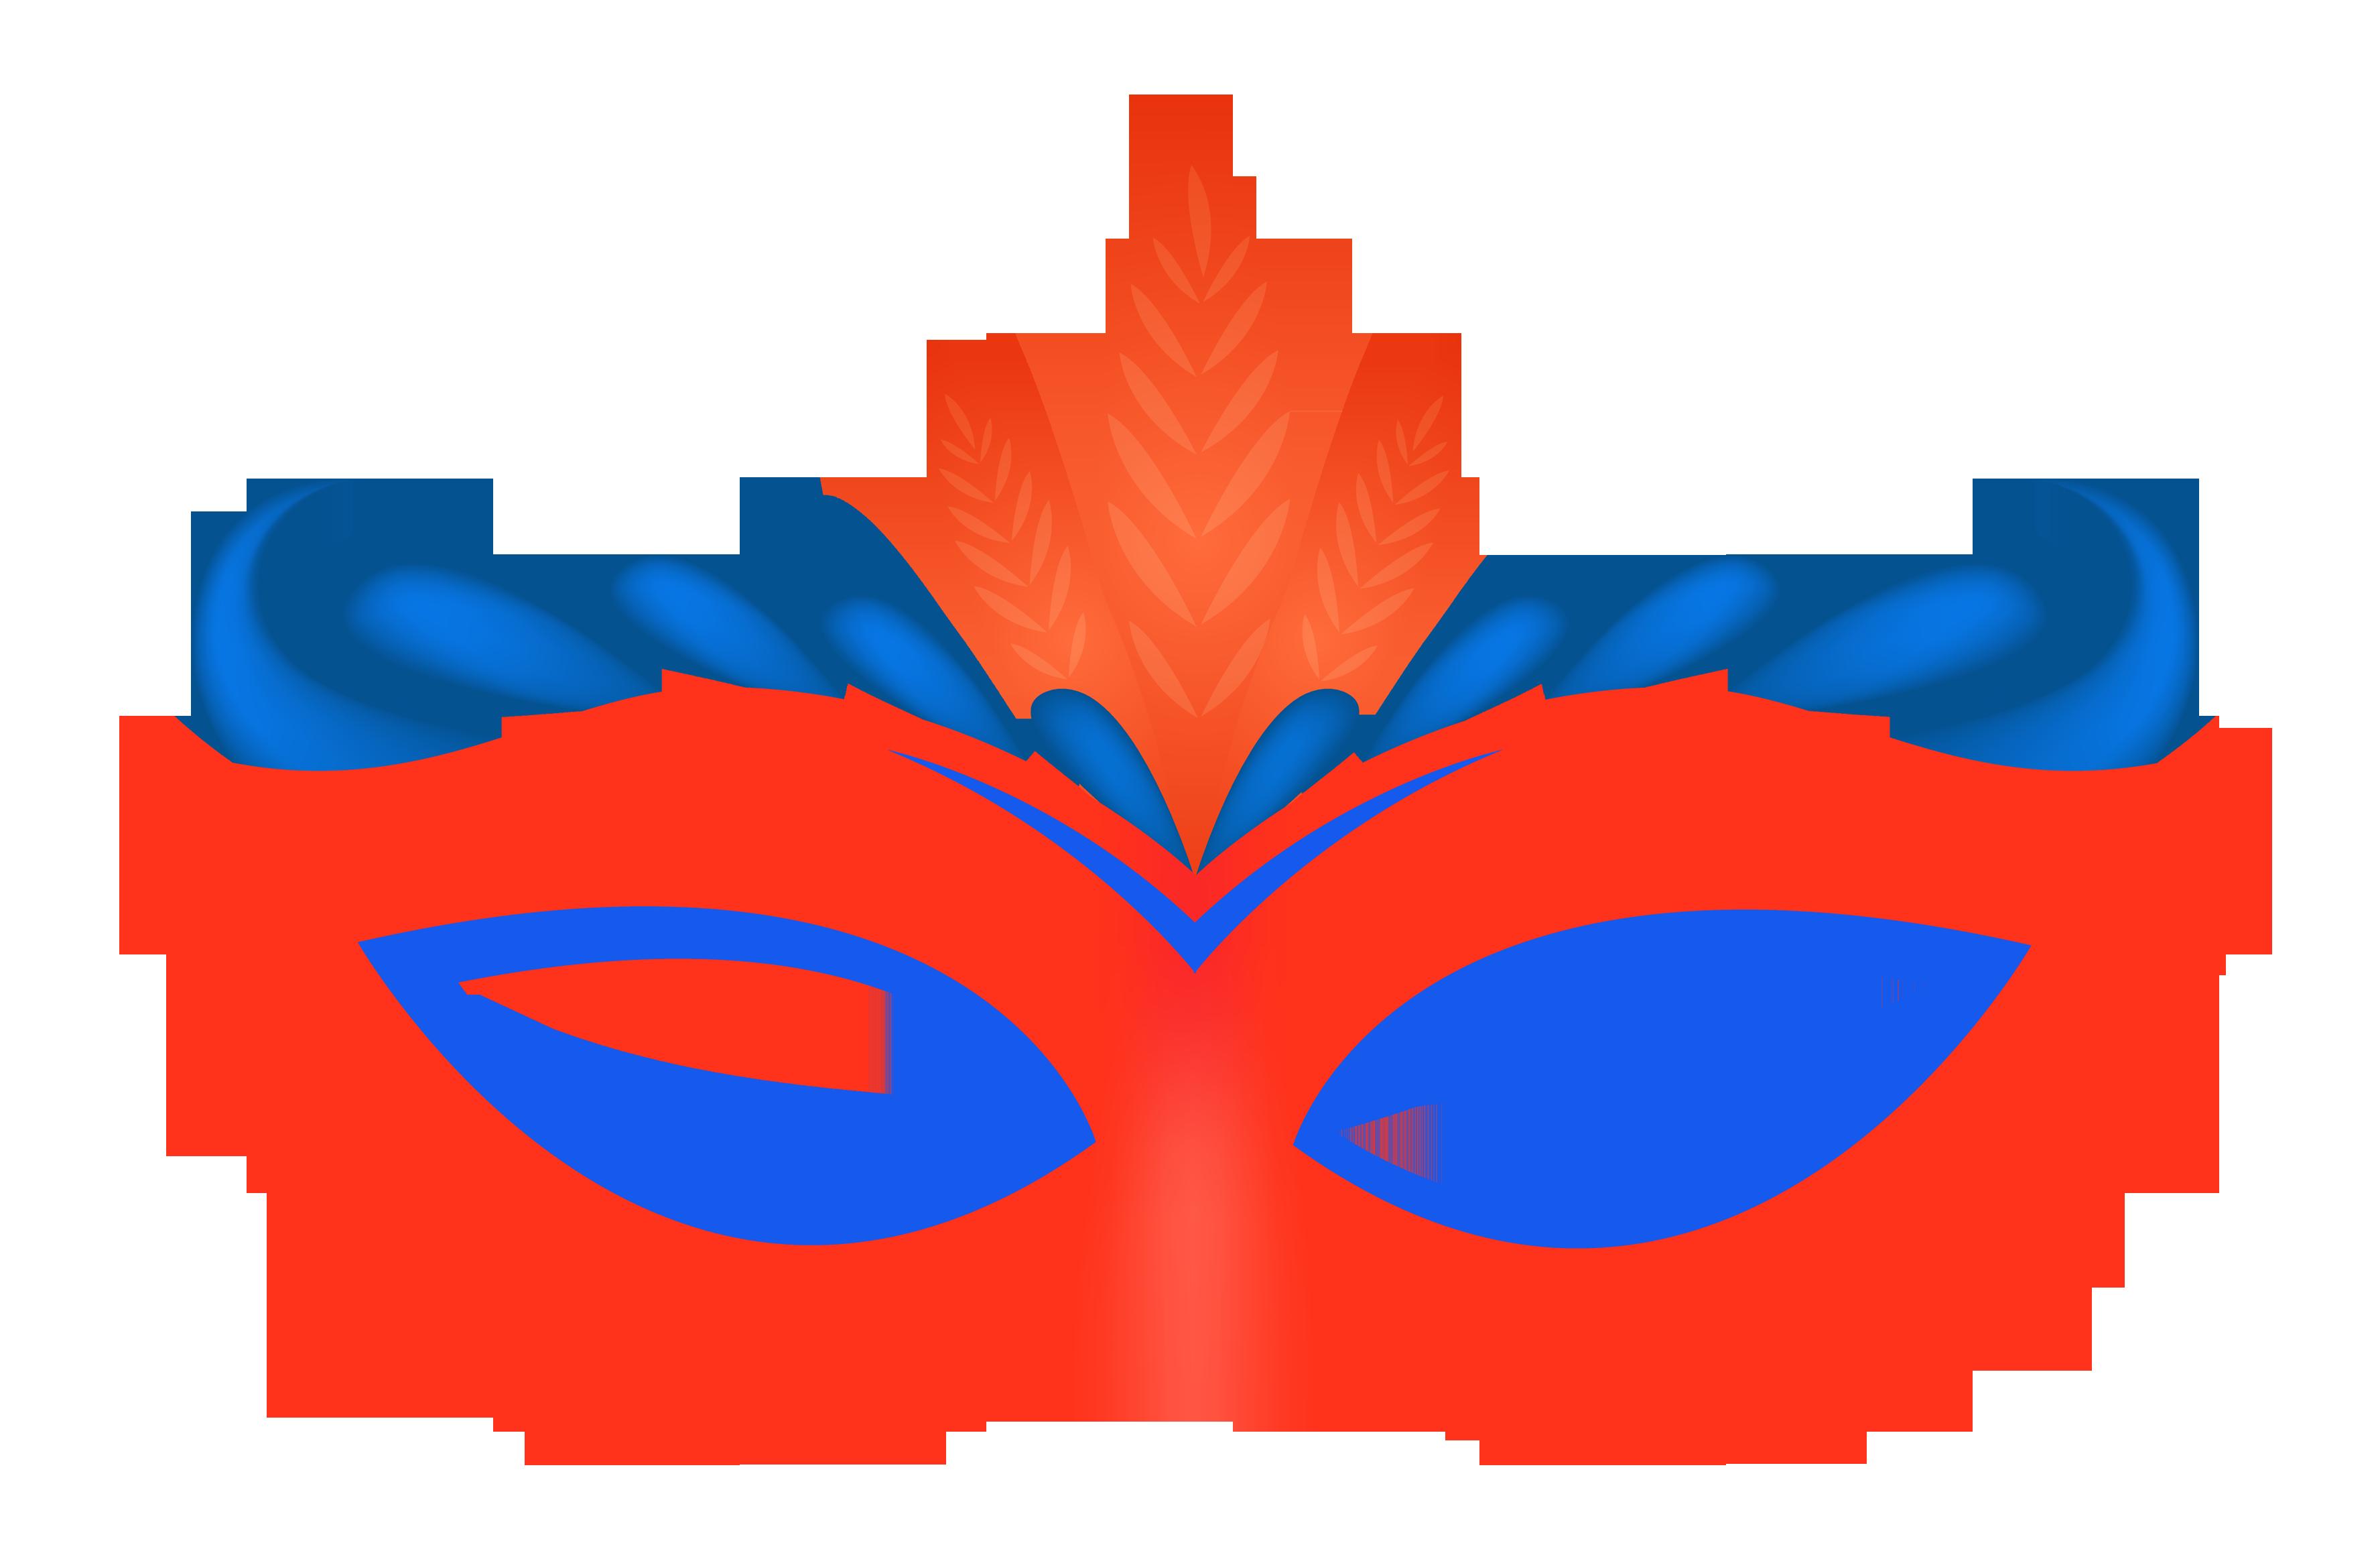 Eye mask png image. Clipart balloon carnival